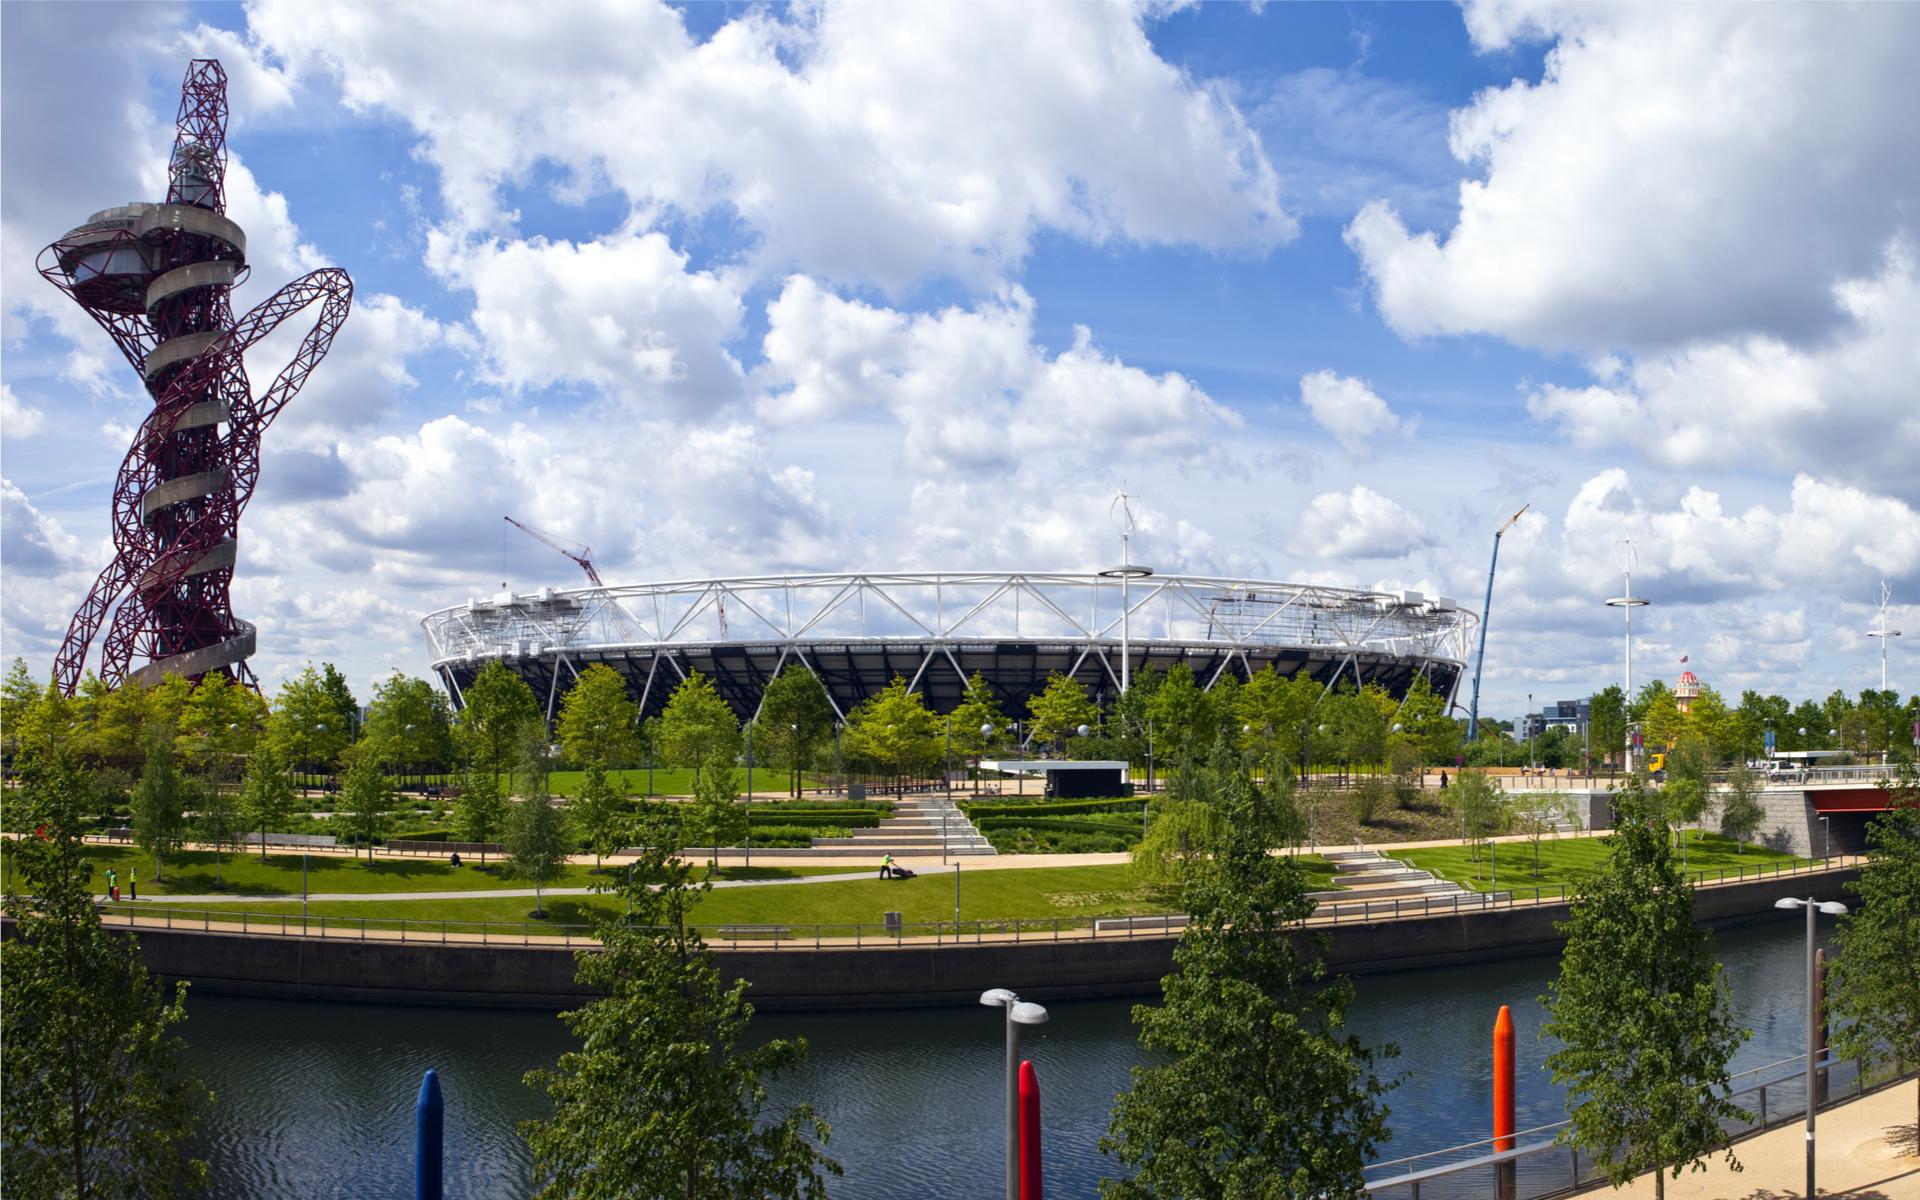 ArcelorMittal Orbit, Queen Elizabeth Olympic Park, Stratford E20